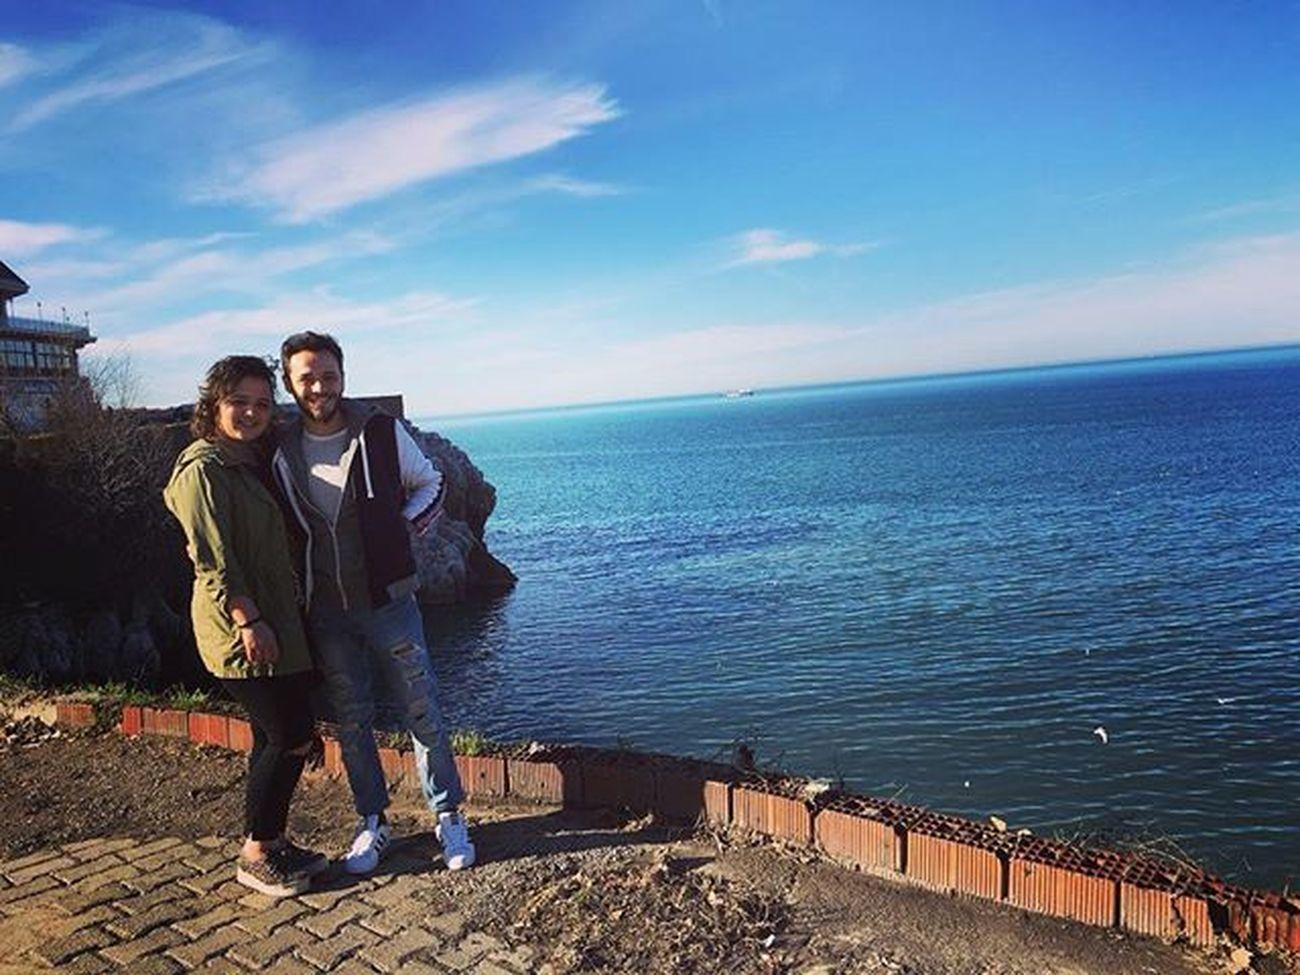 Kuzummmm 🐼 Bahadircansu Sahil Zonguldak Friend Sea Blue Kadraj Kadraj_arkasi